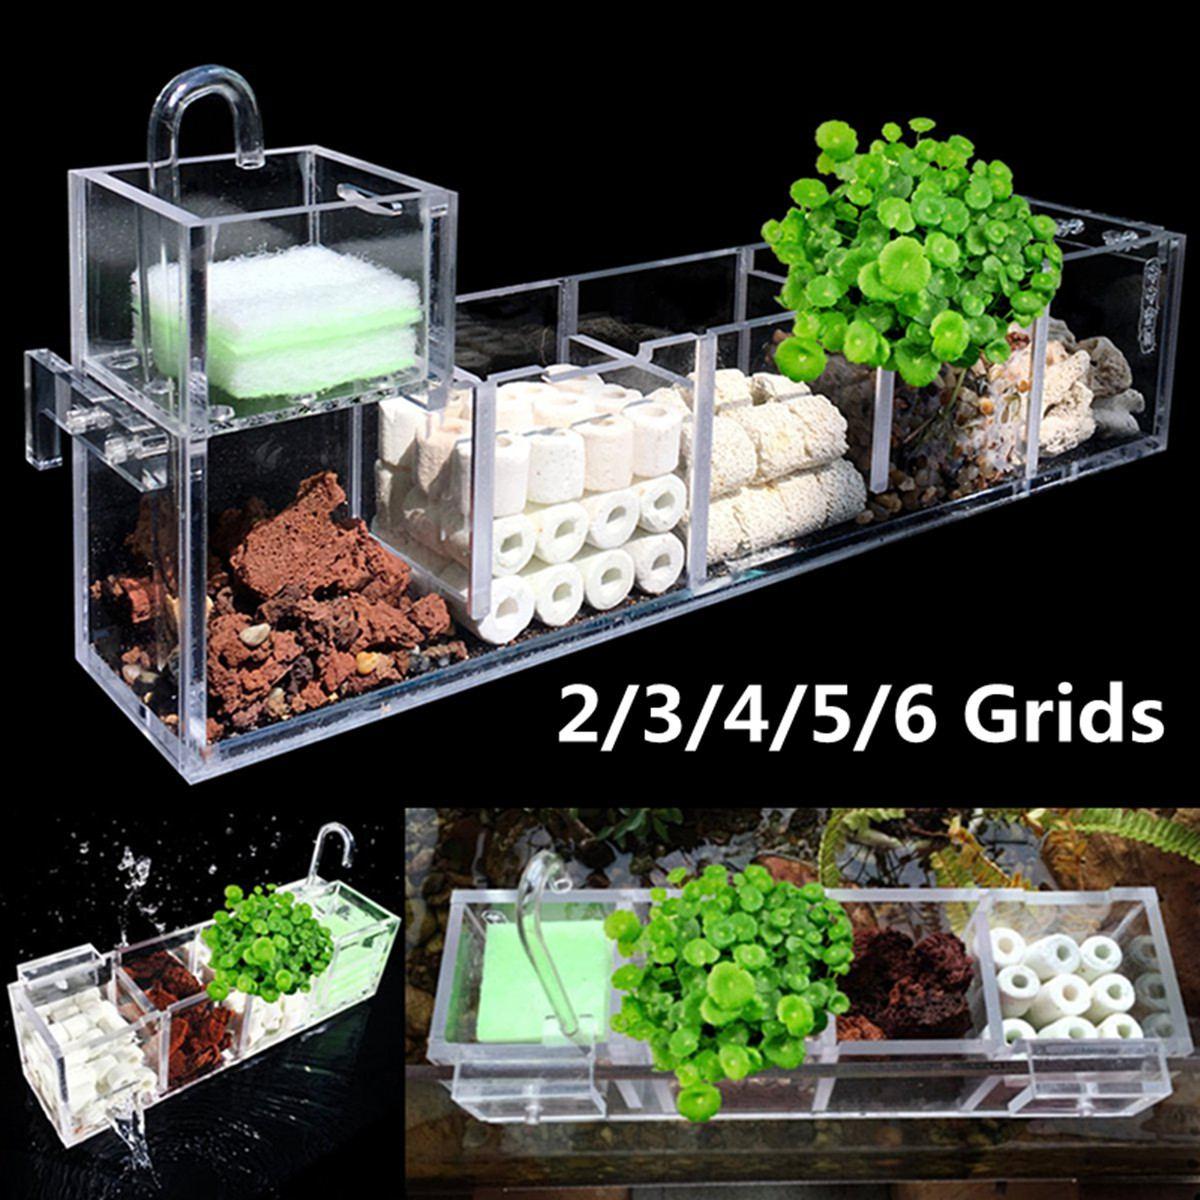 Fish Tank Aquarium Filter Box 2-6 Grids Acrylic External Hanging Water Purifier Aquatic Pet Cage Increase Oxygen Filter Supplies